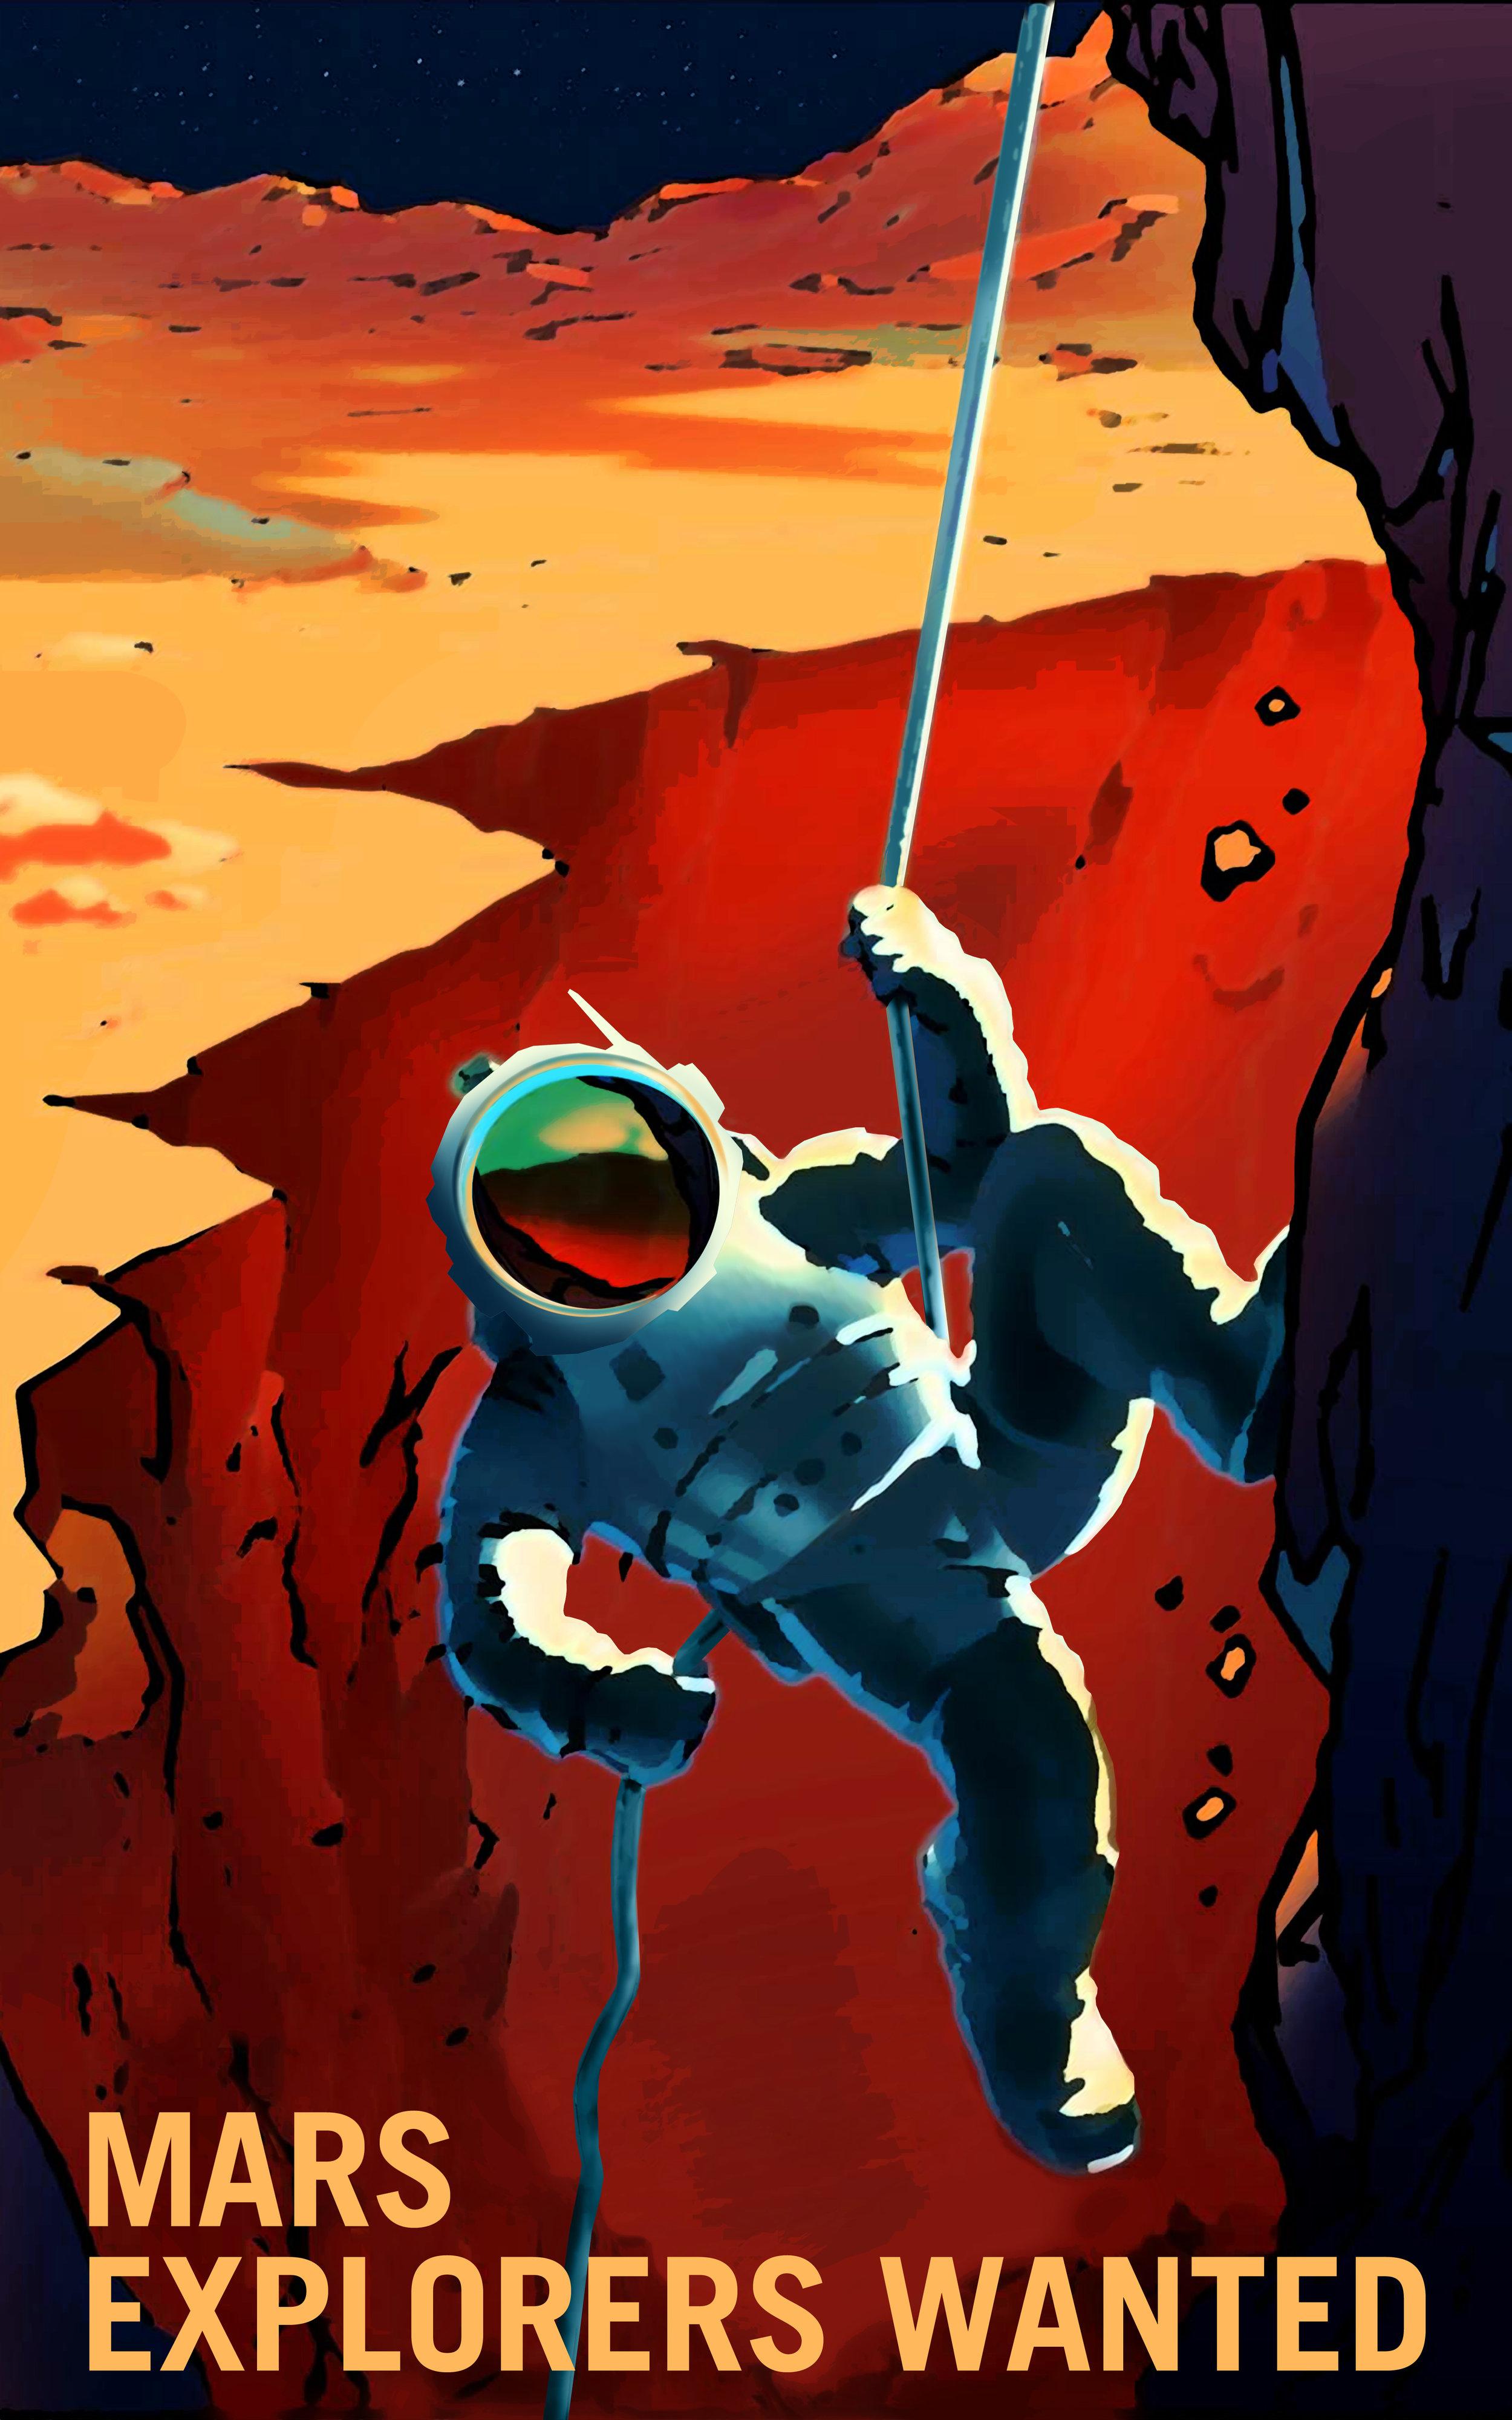 P01-Explorers-Wanted-NASA-Recruitment-Poster.jpg